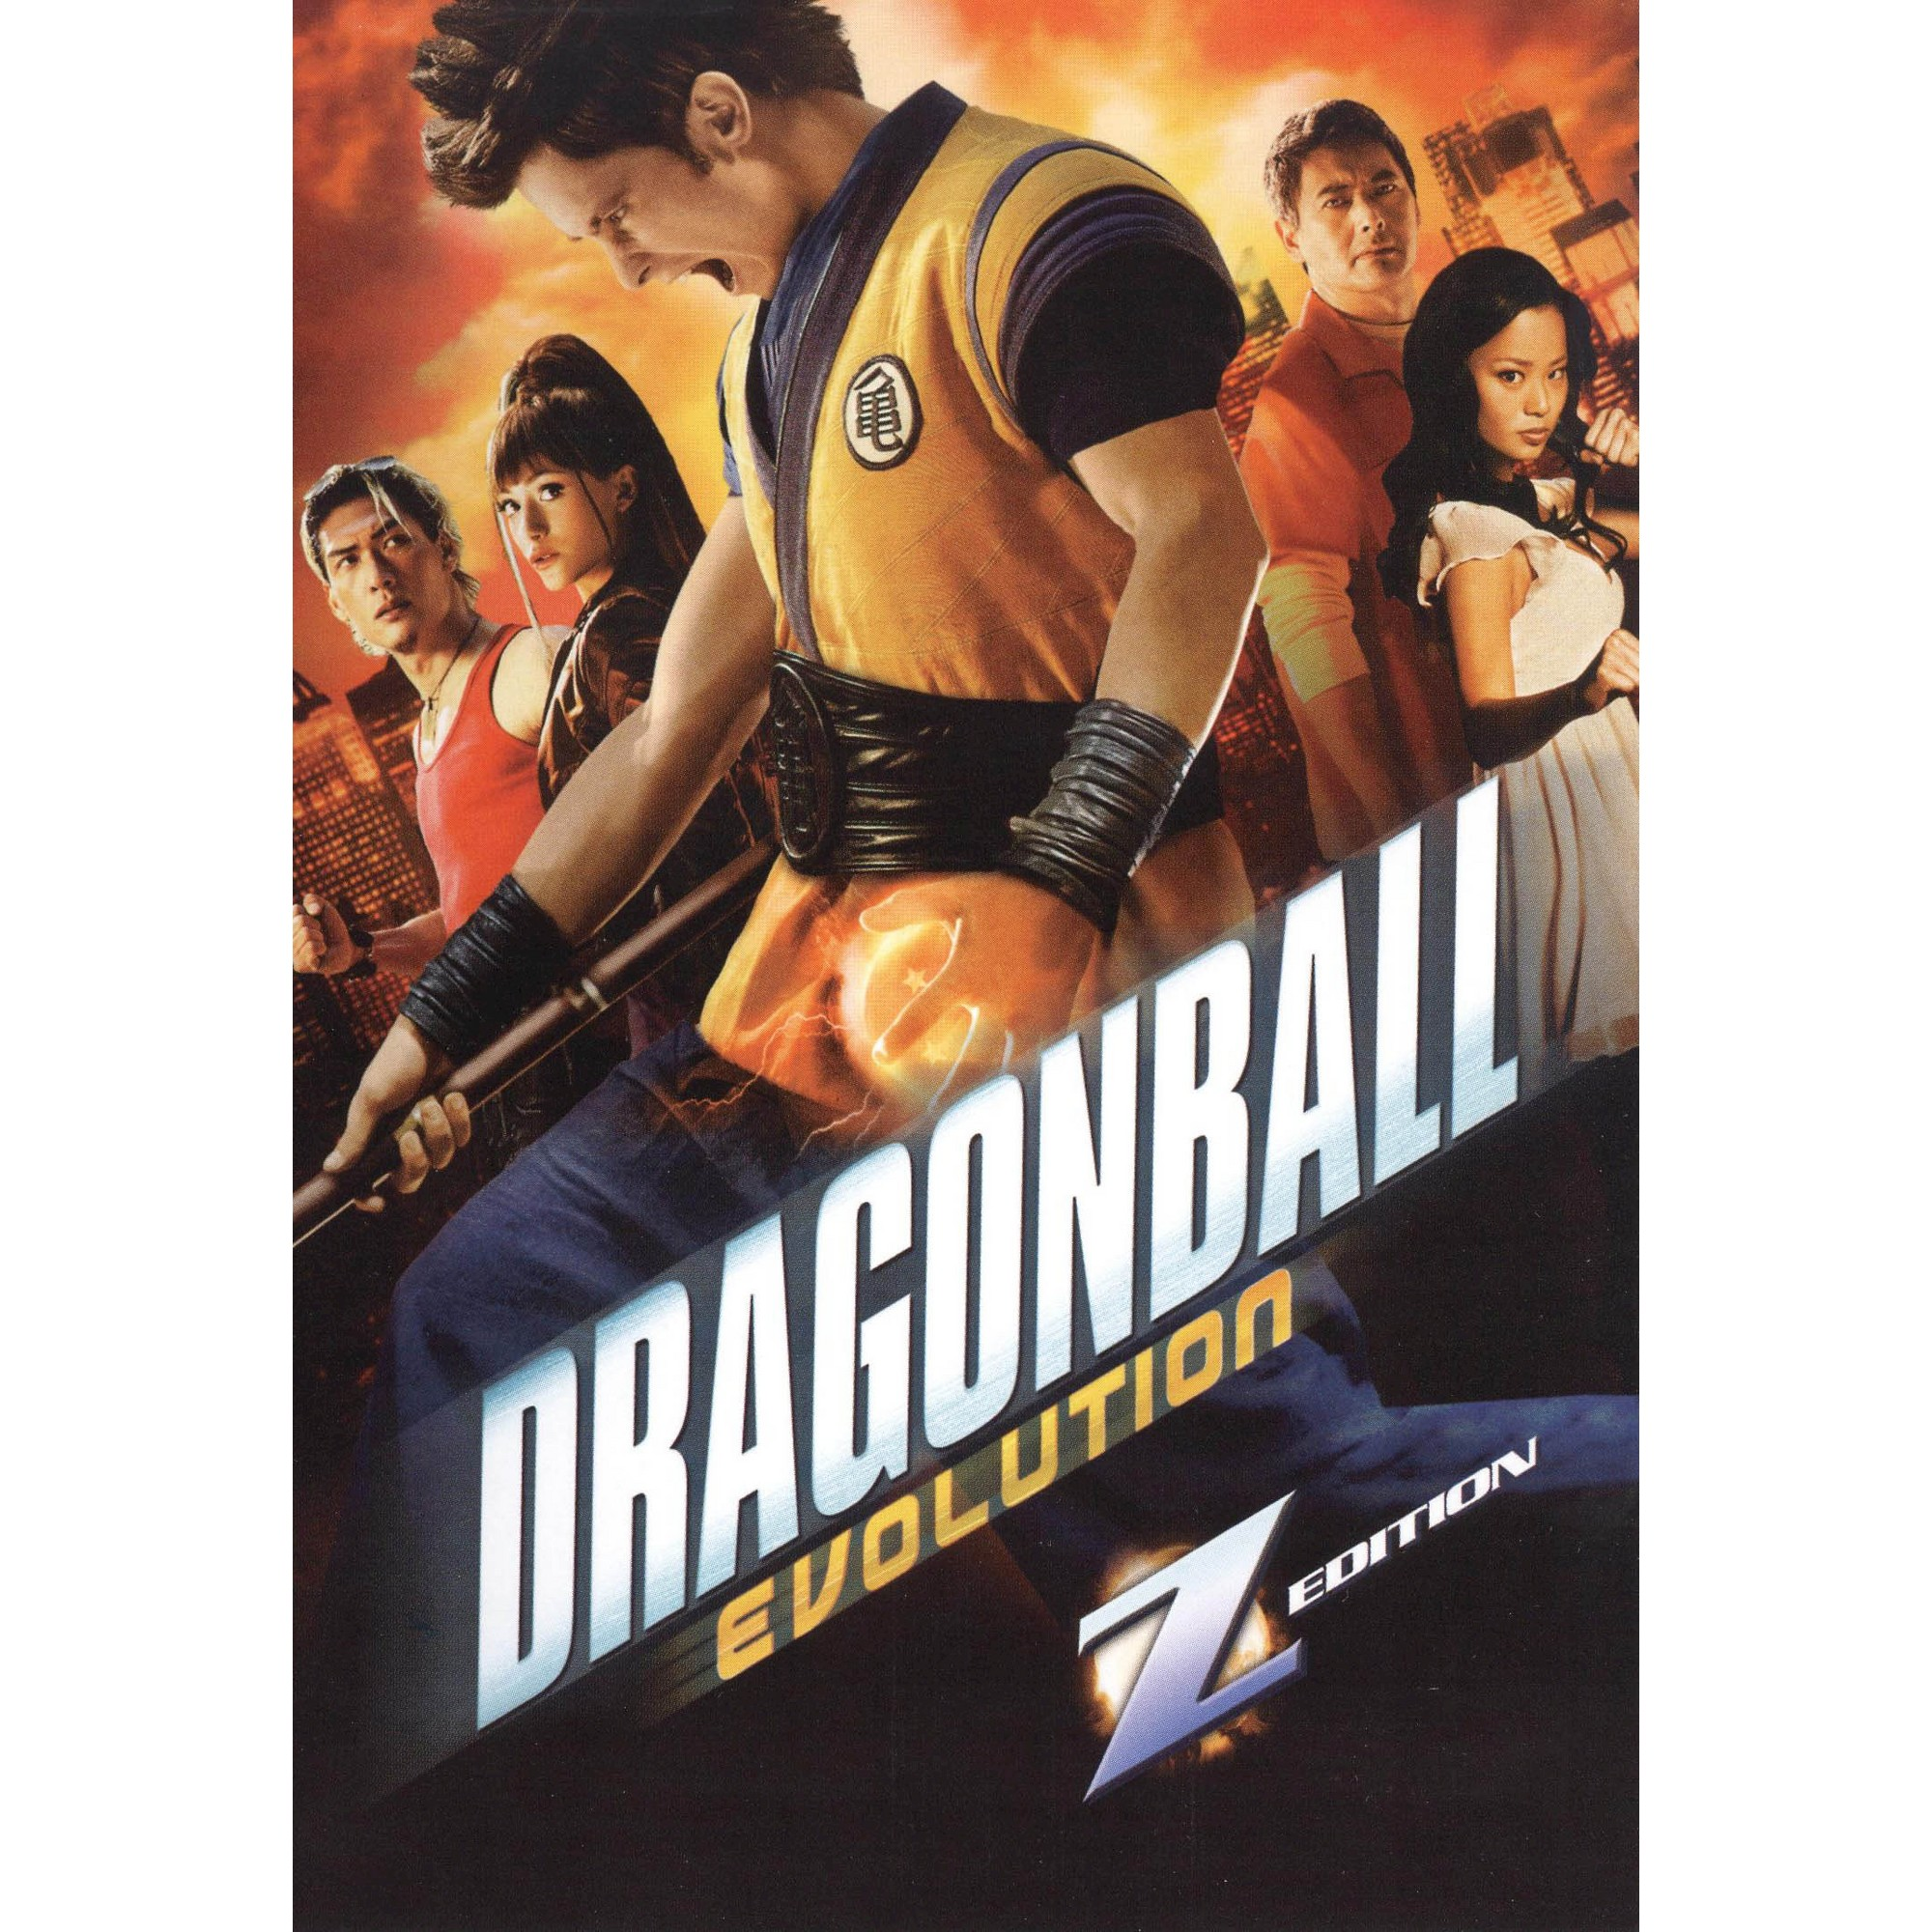 Dragonball Evolution Z Edition Dvd Video Dragonball Evolution Evolution Free Movies Online